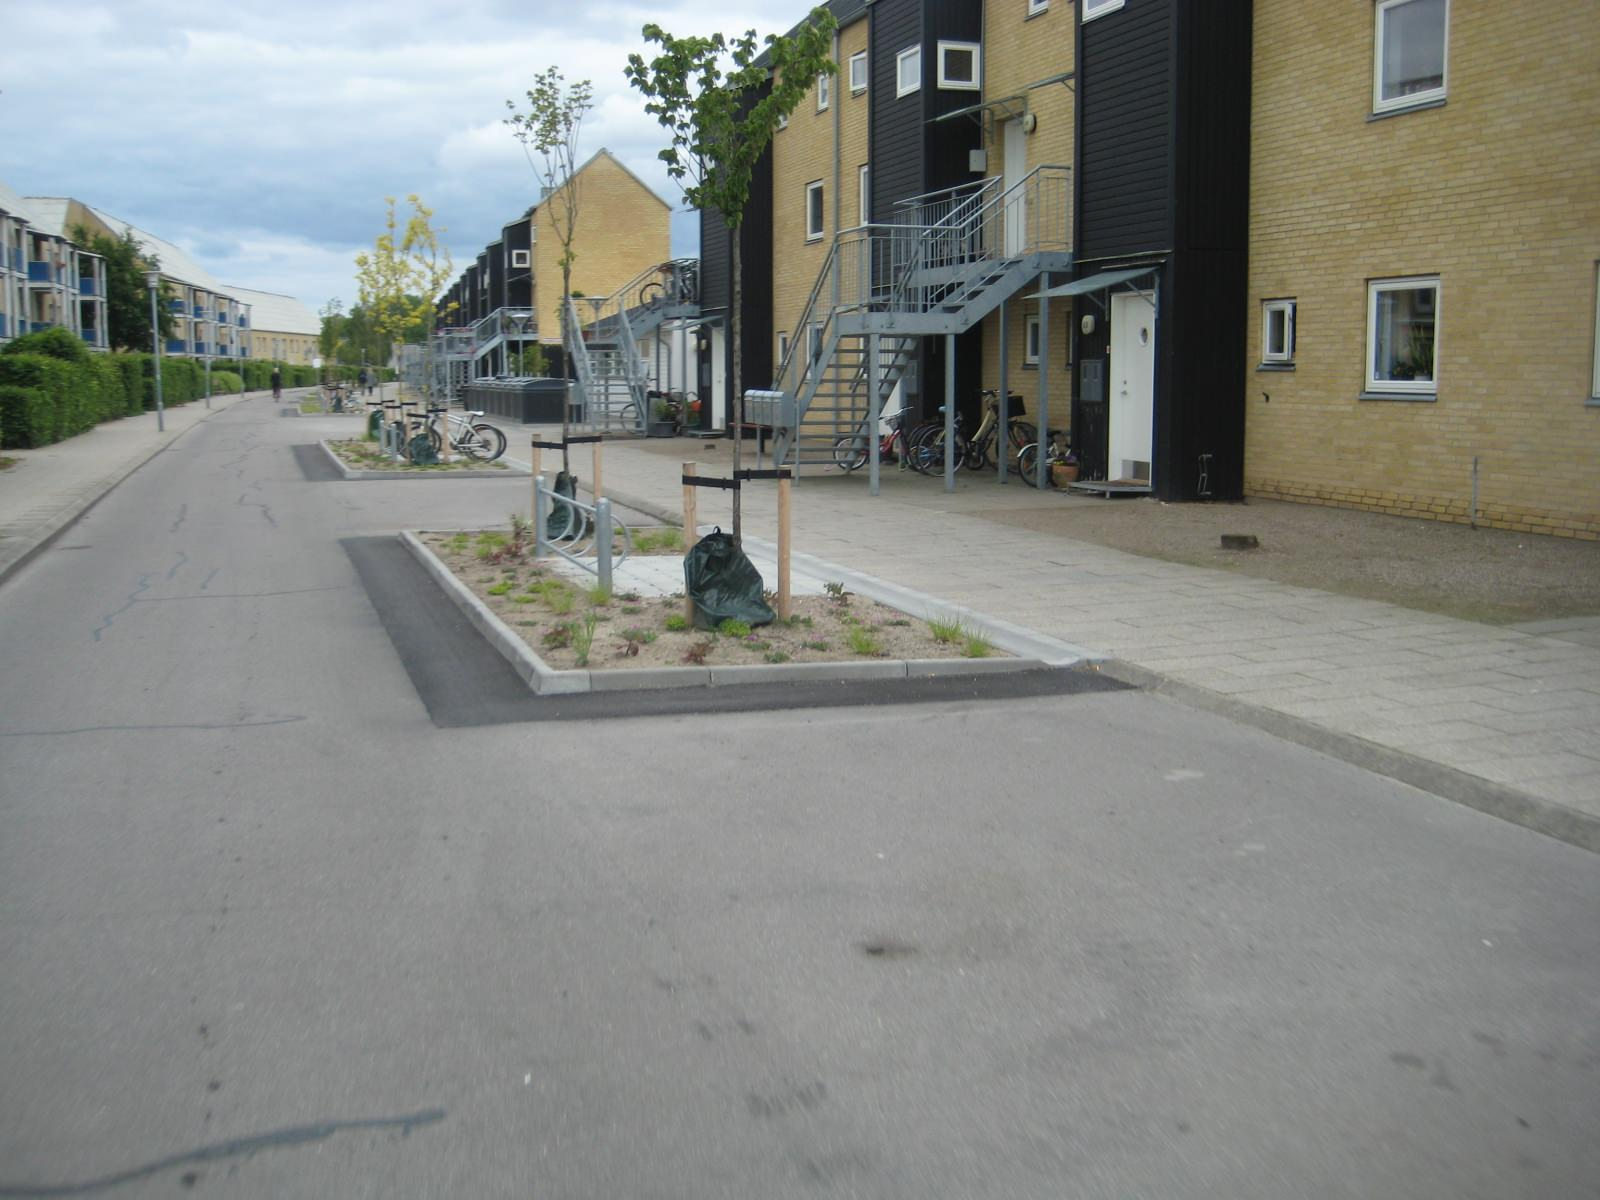 Fahrradparken Radabstellanlage Kopenhagen Fahrradstraße Radverkehr